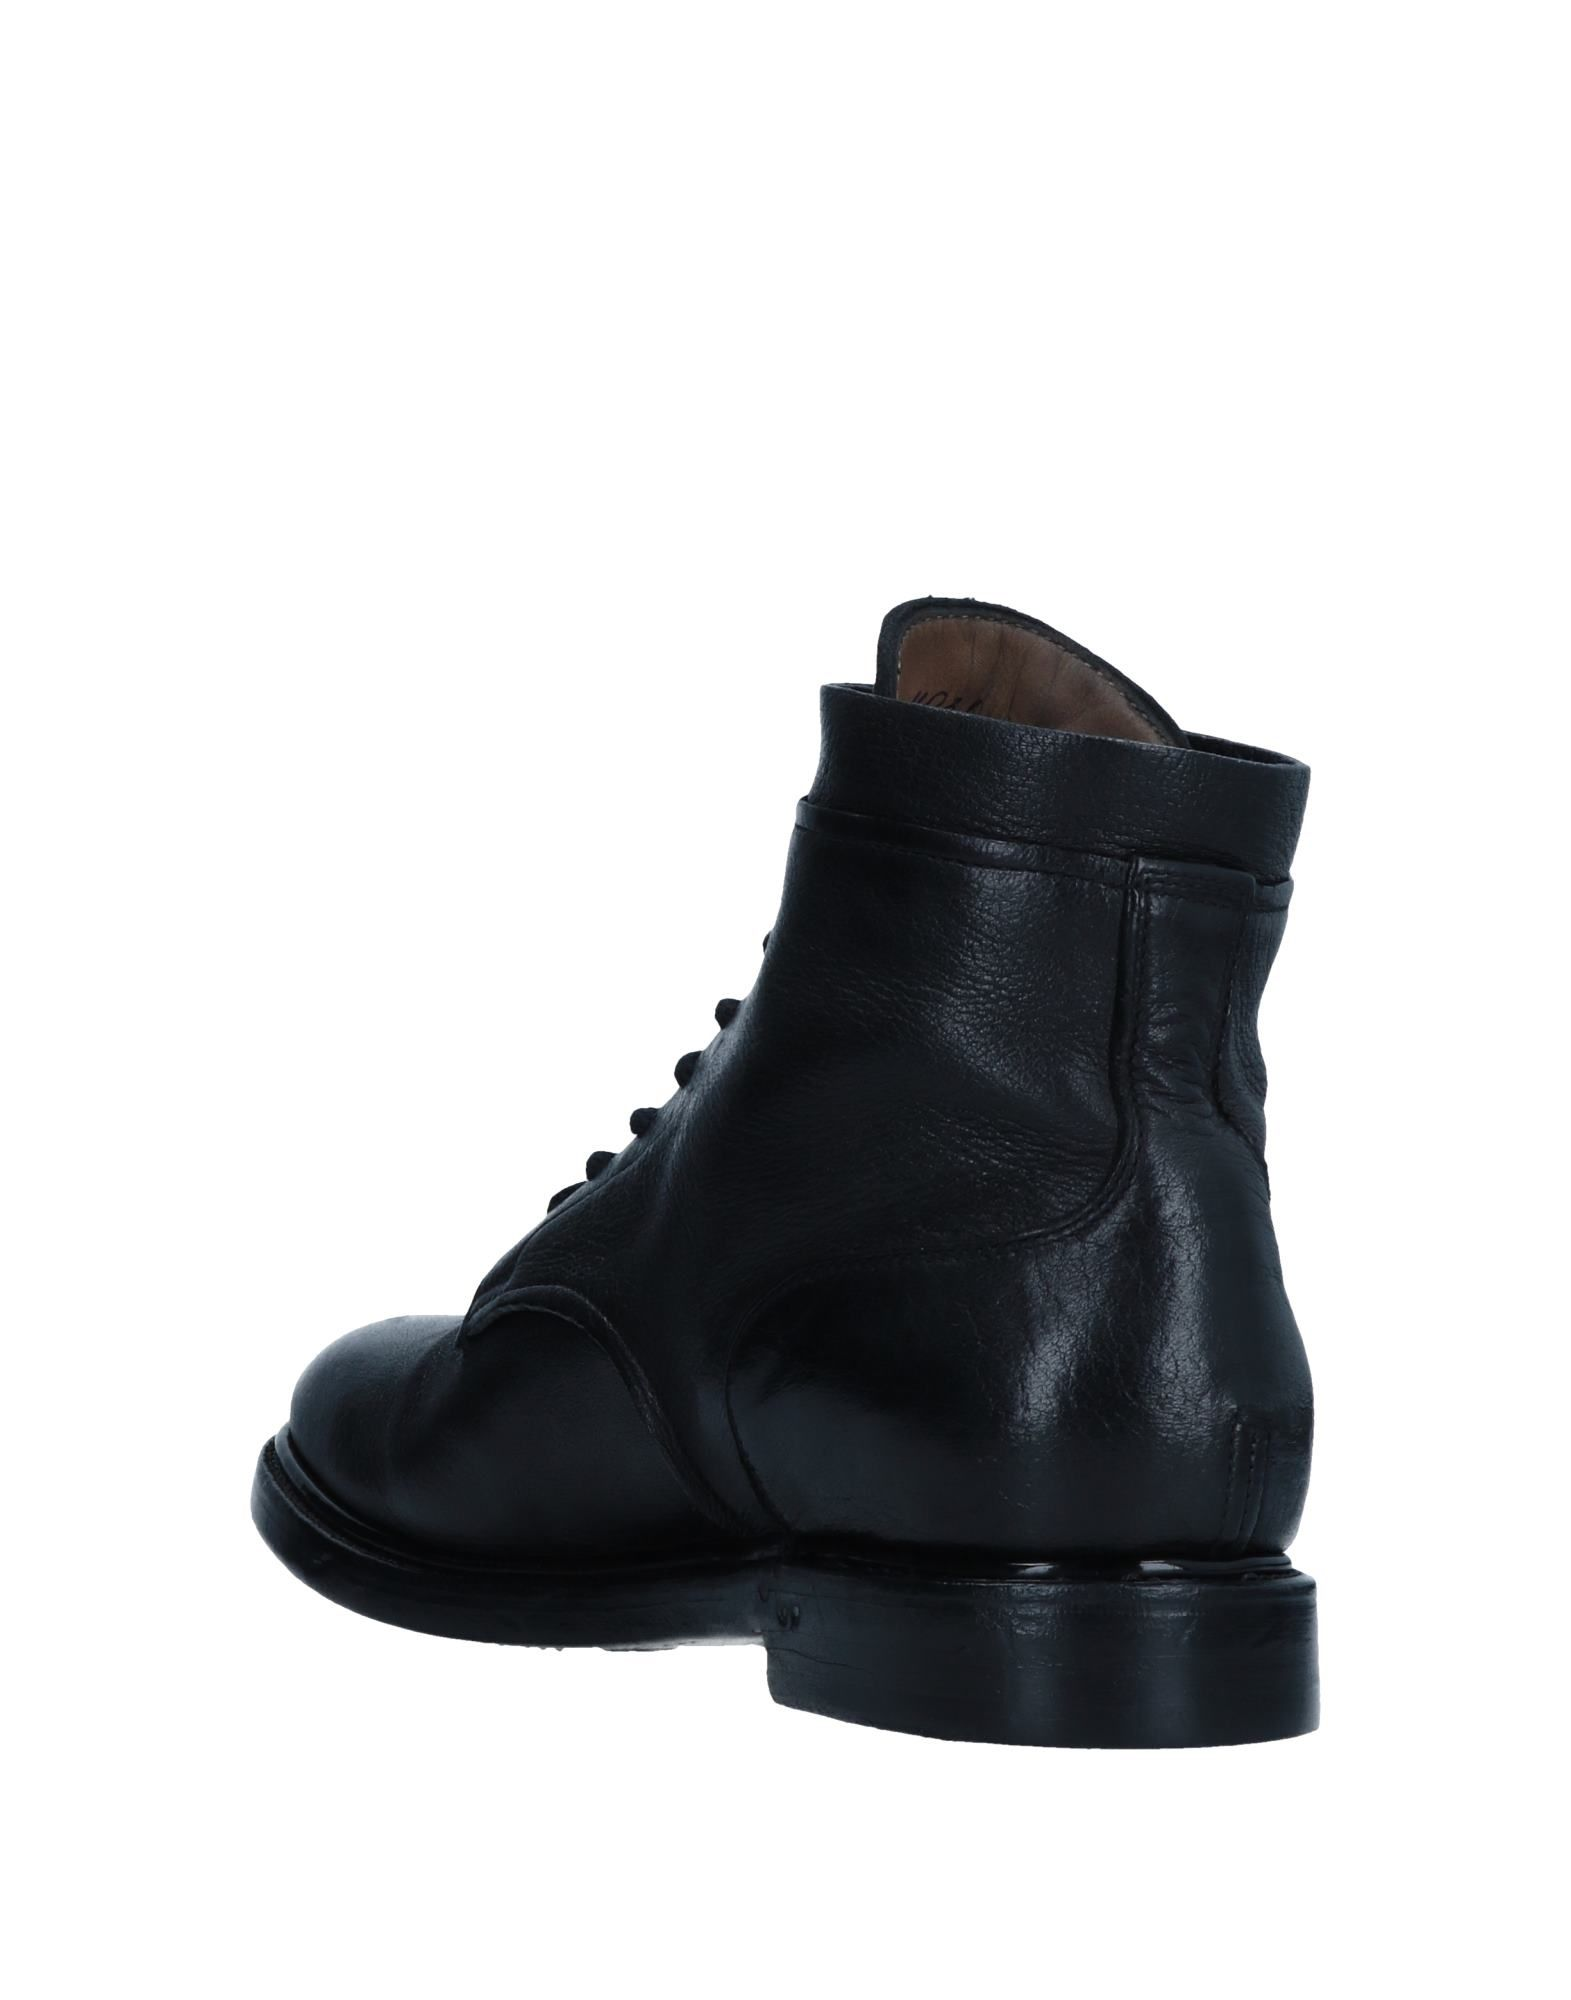 Silvano Sassetti Boots - Men Men Men Silvano Sassetti Boots online on  United Kingdom - 11554680FD e81afc